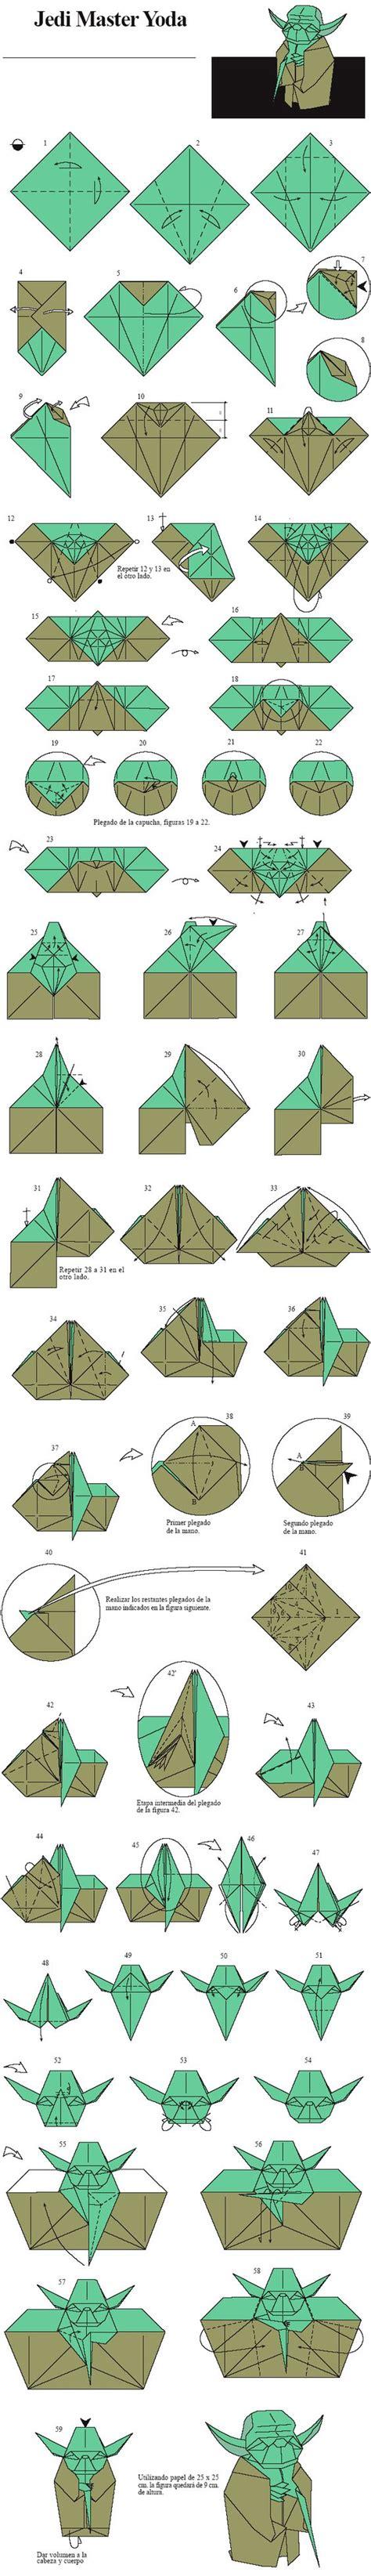 Origami Jedi - origami jedi master yoda designed by fumiaki kawahata